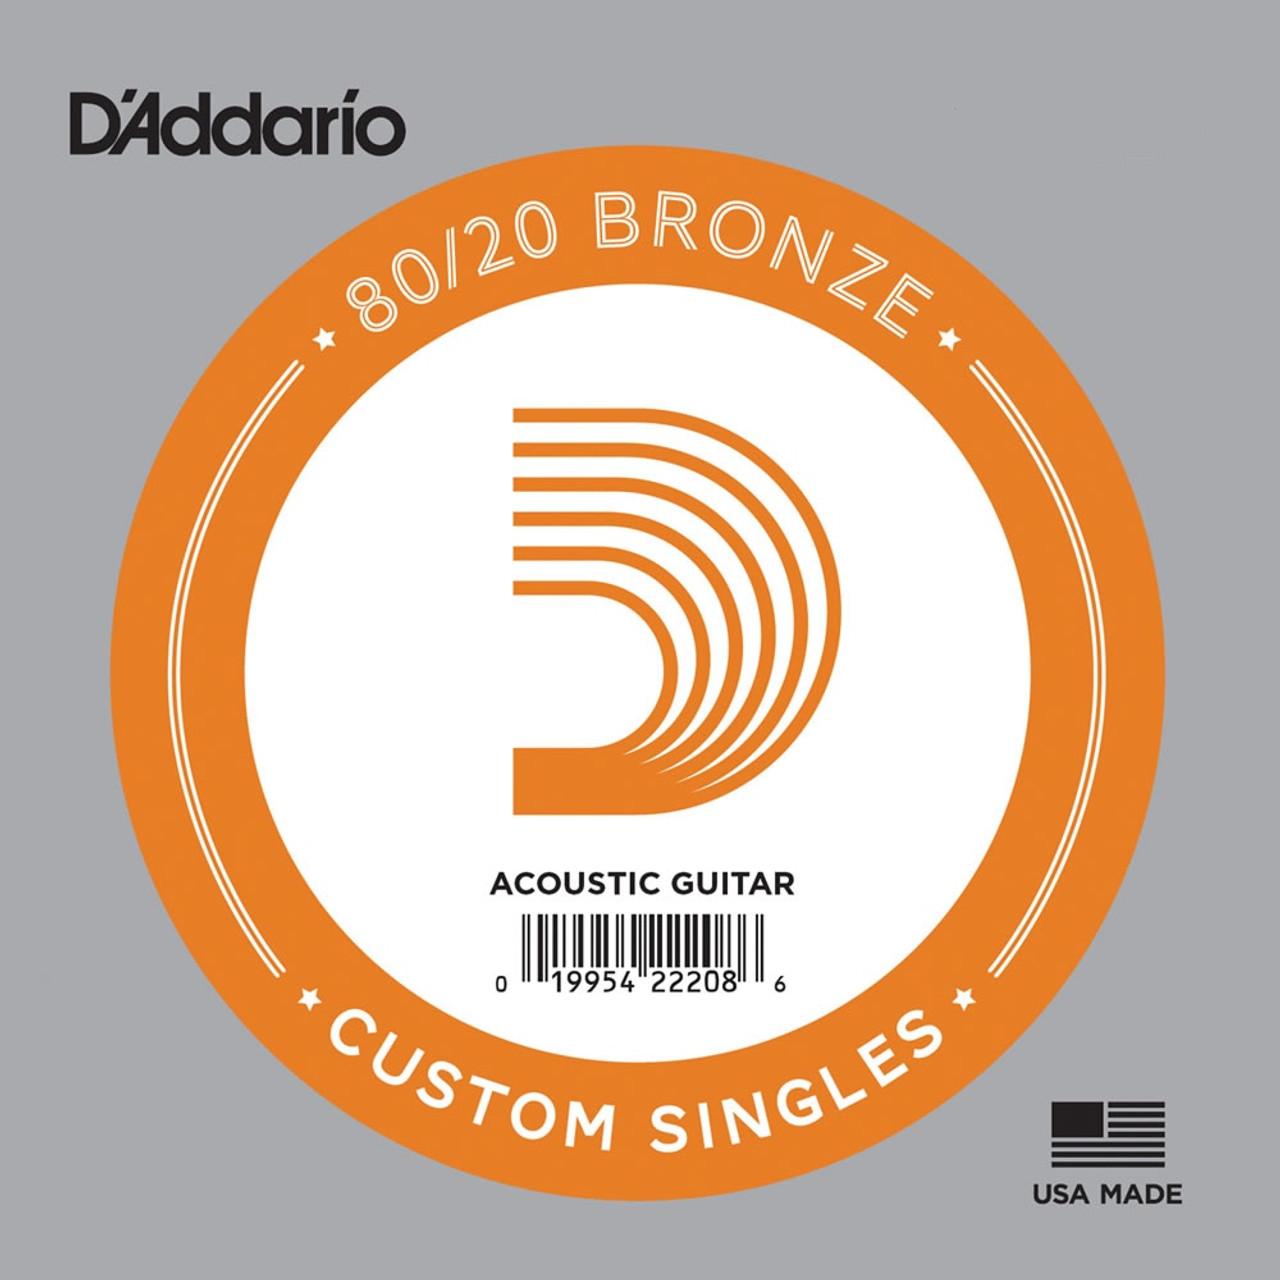 D'addario Bronze Wound Single Strings Ireland